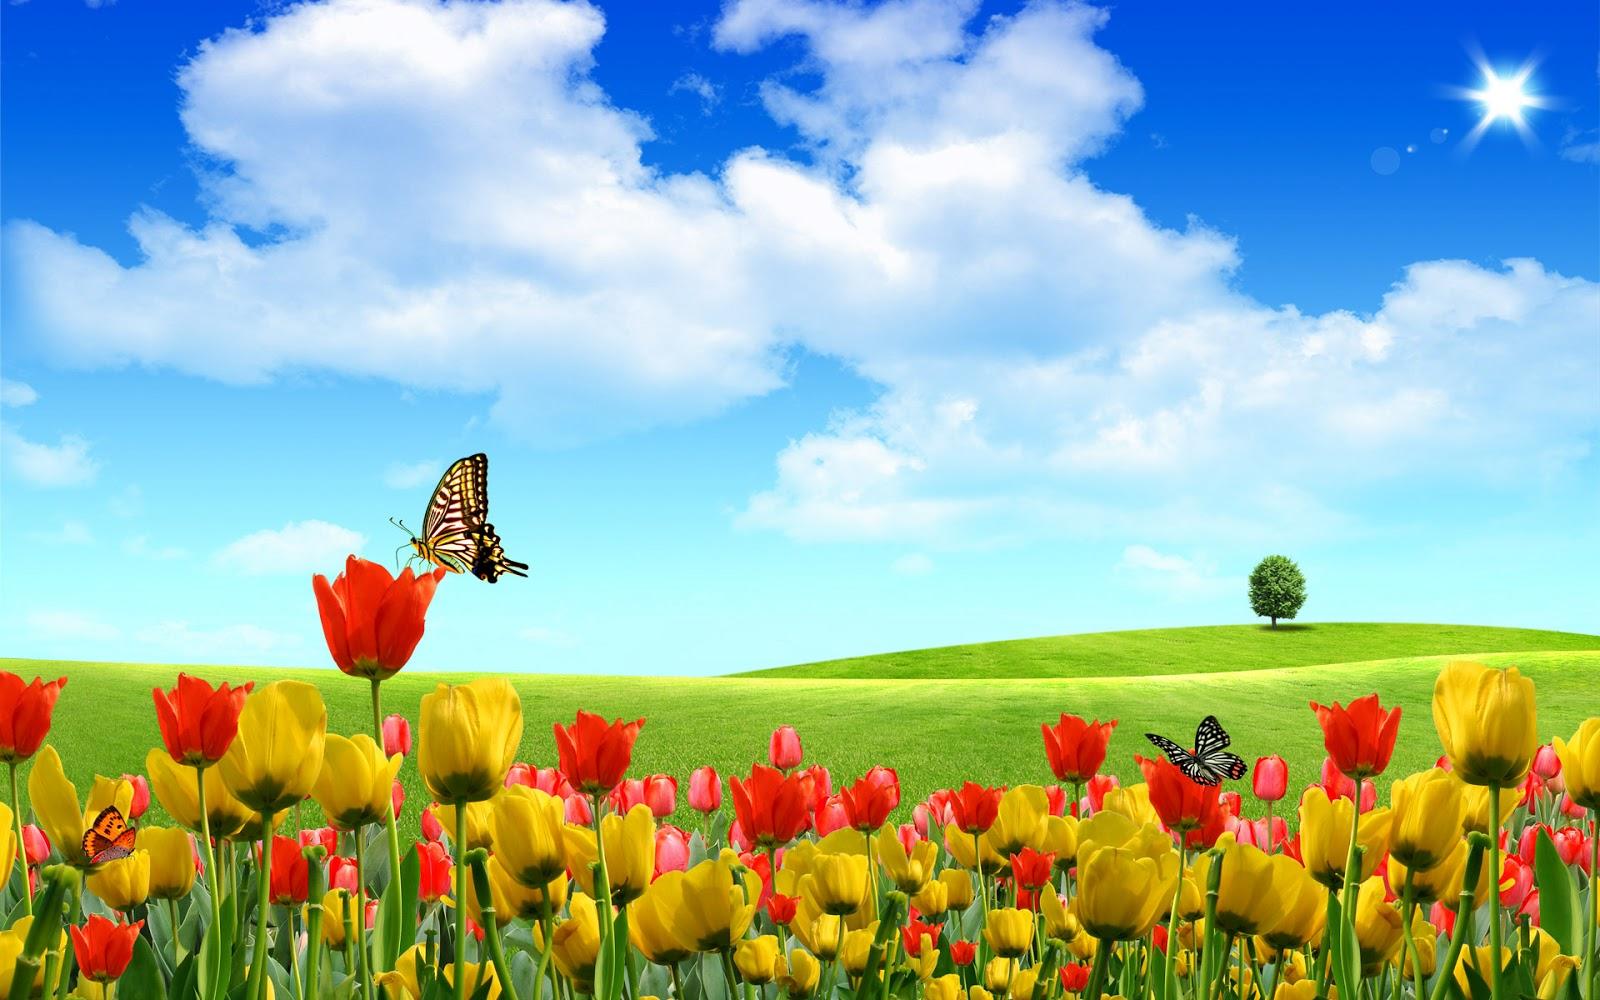 Fondo Pantalla Paisajes Animados Tulipanes Imagenes Hilandy